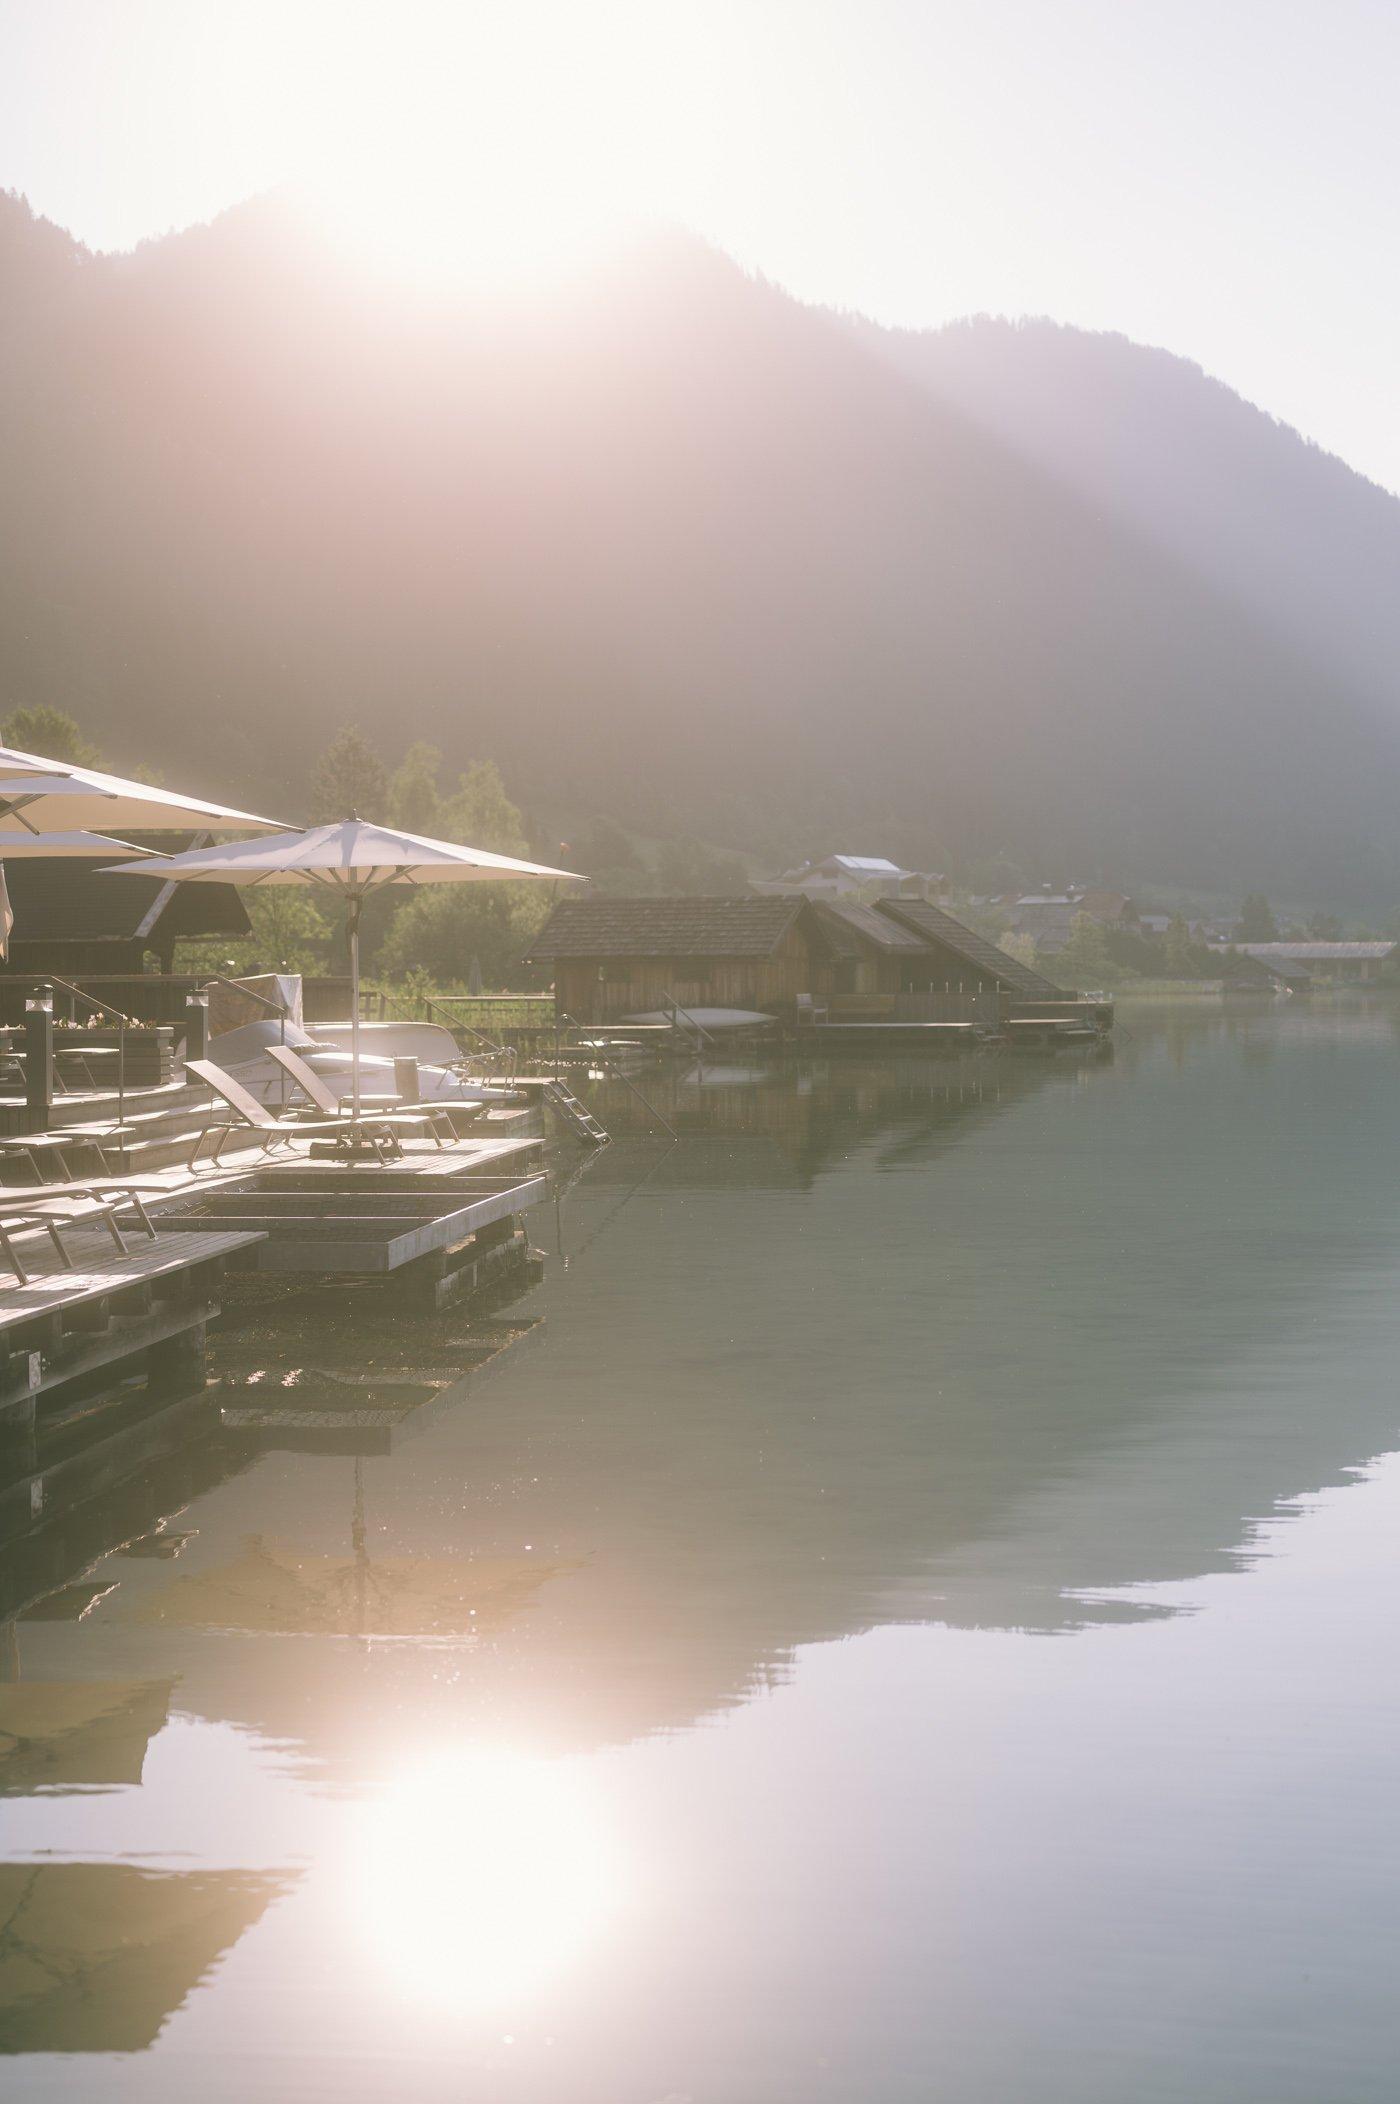 Lake spa of Strandhotel Weissensee